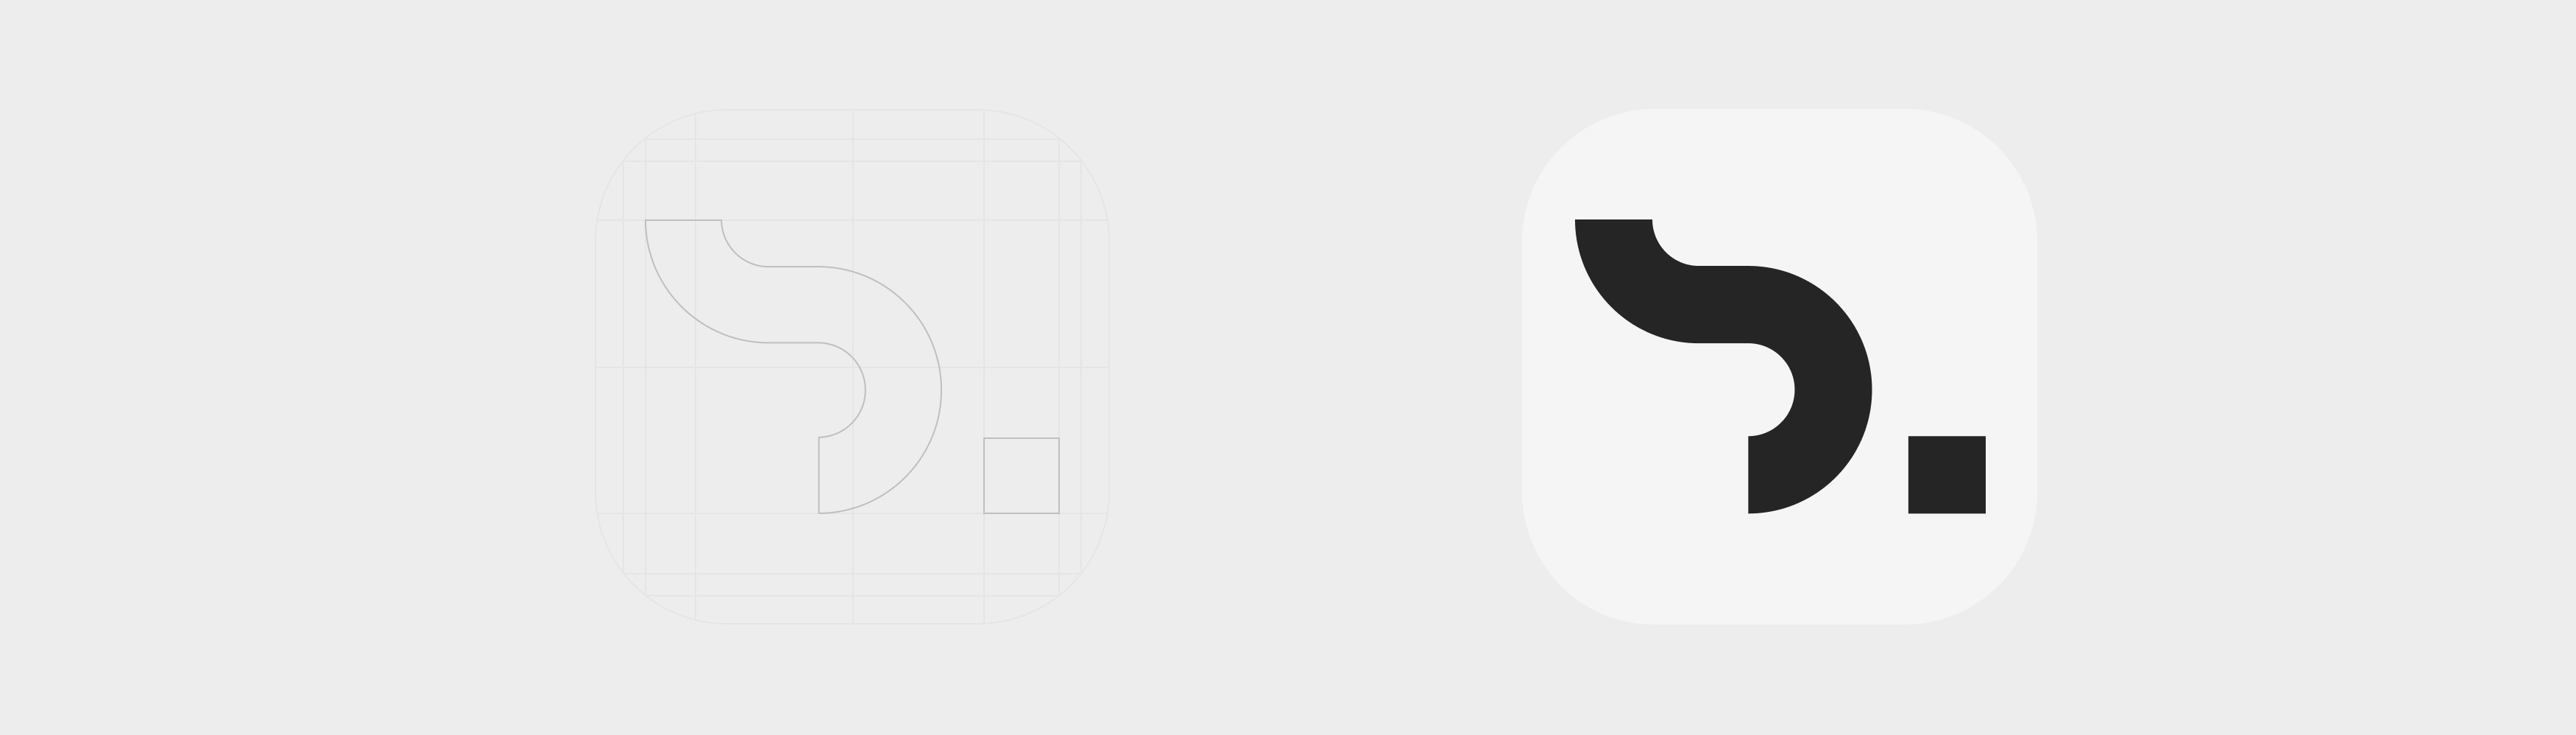 00-app-build-sense